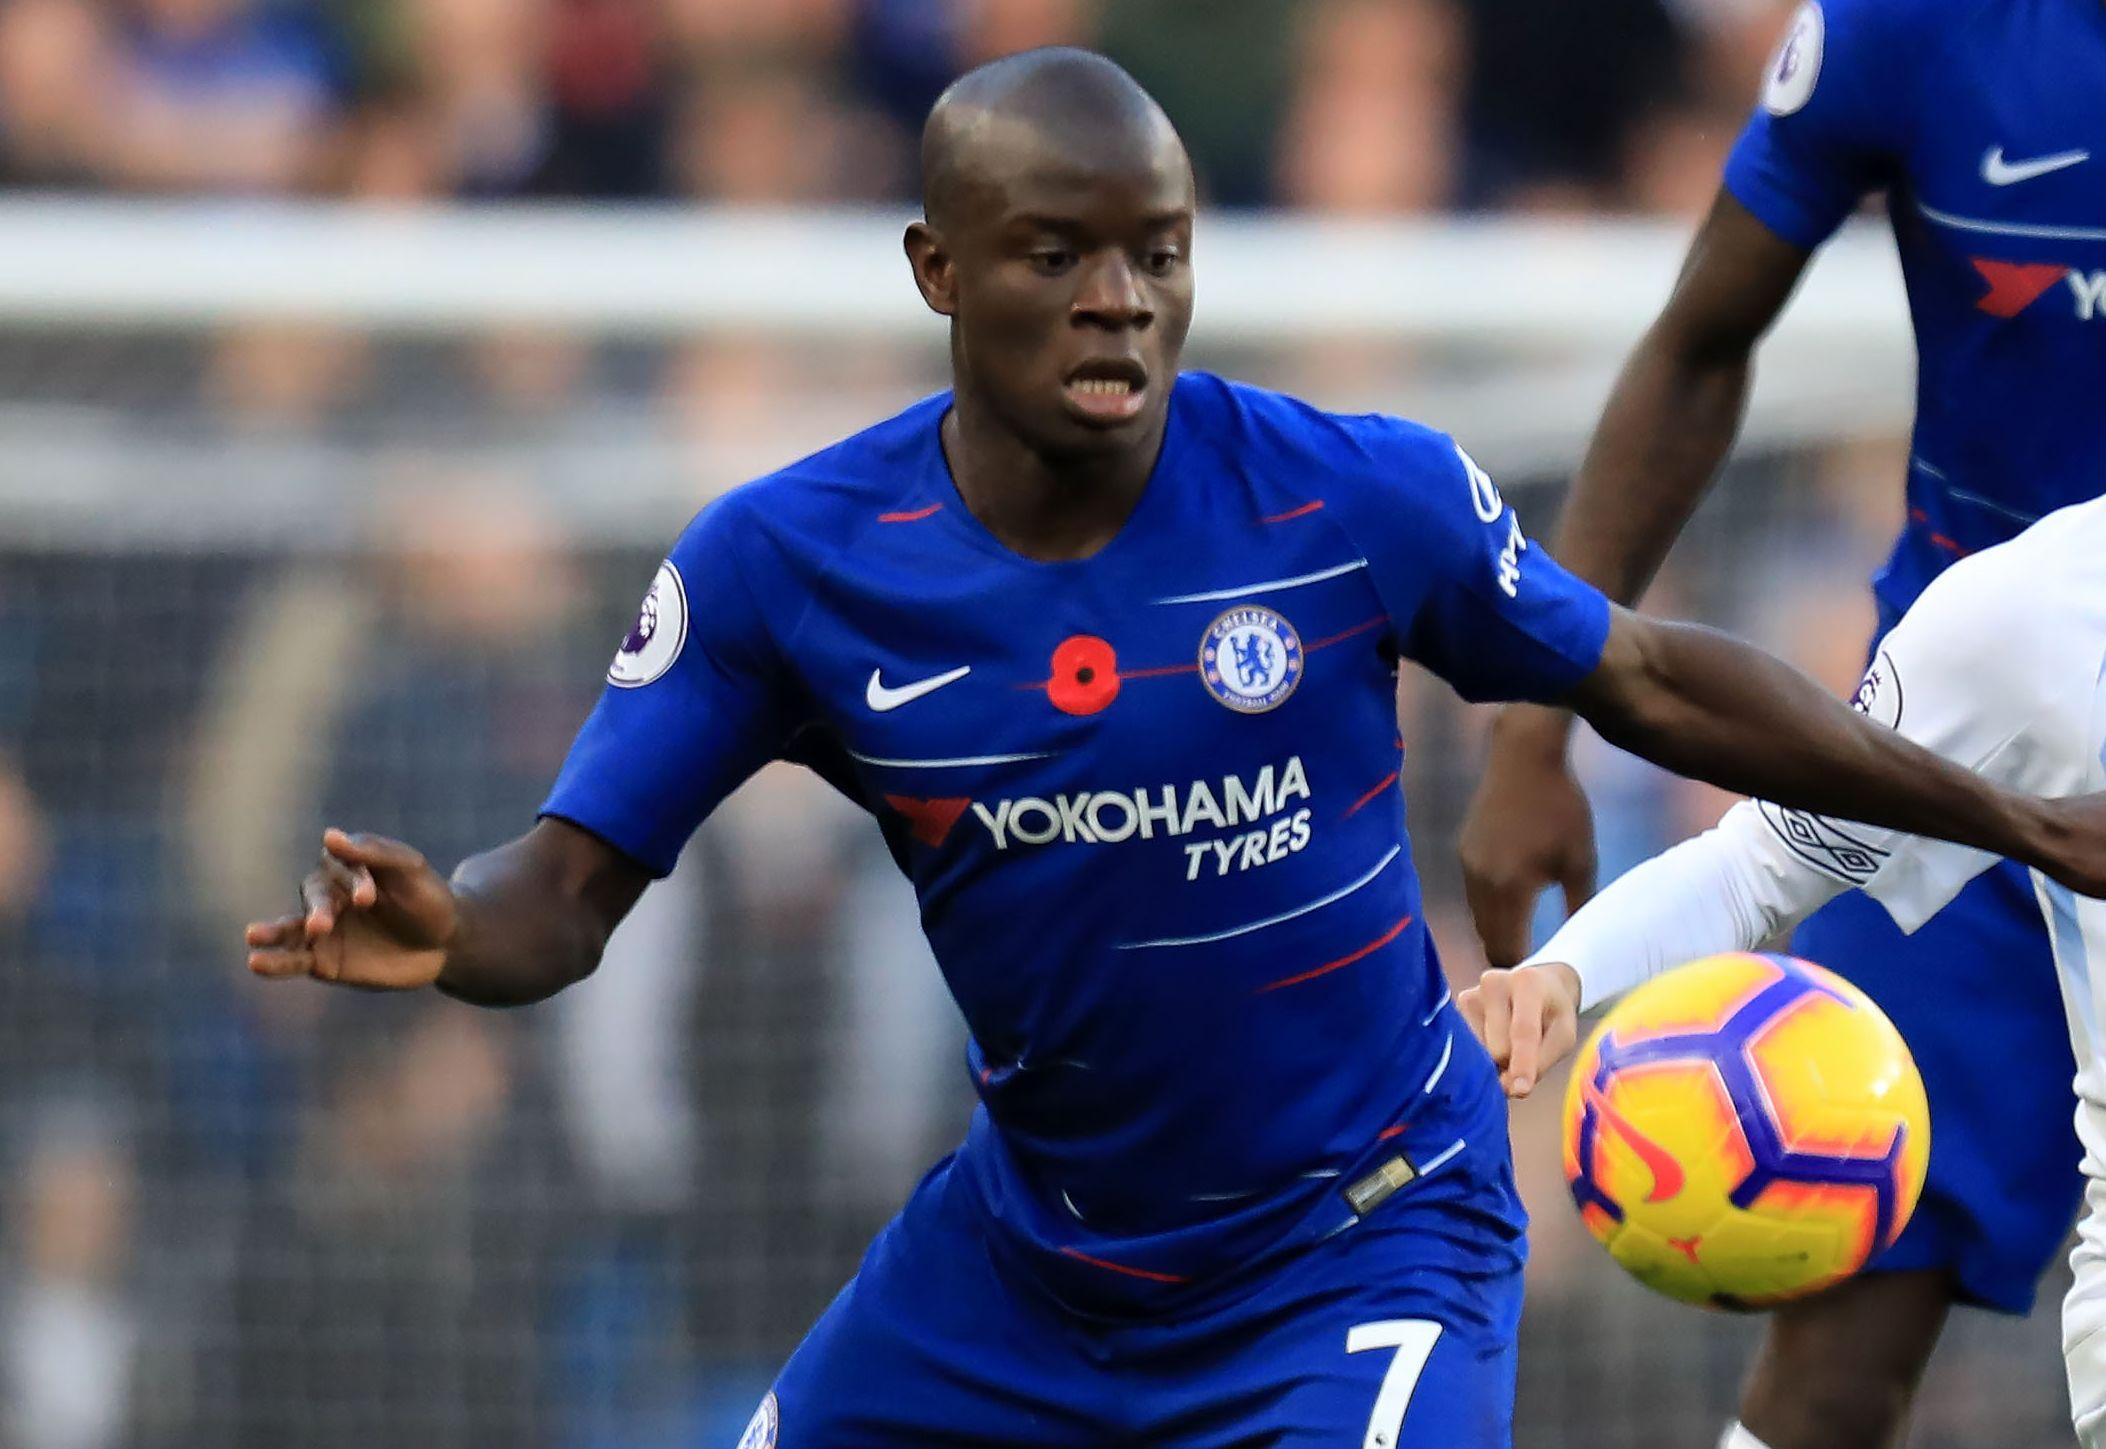 Football - Etranger - Premier League : Tottenham-Chelsea en direct